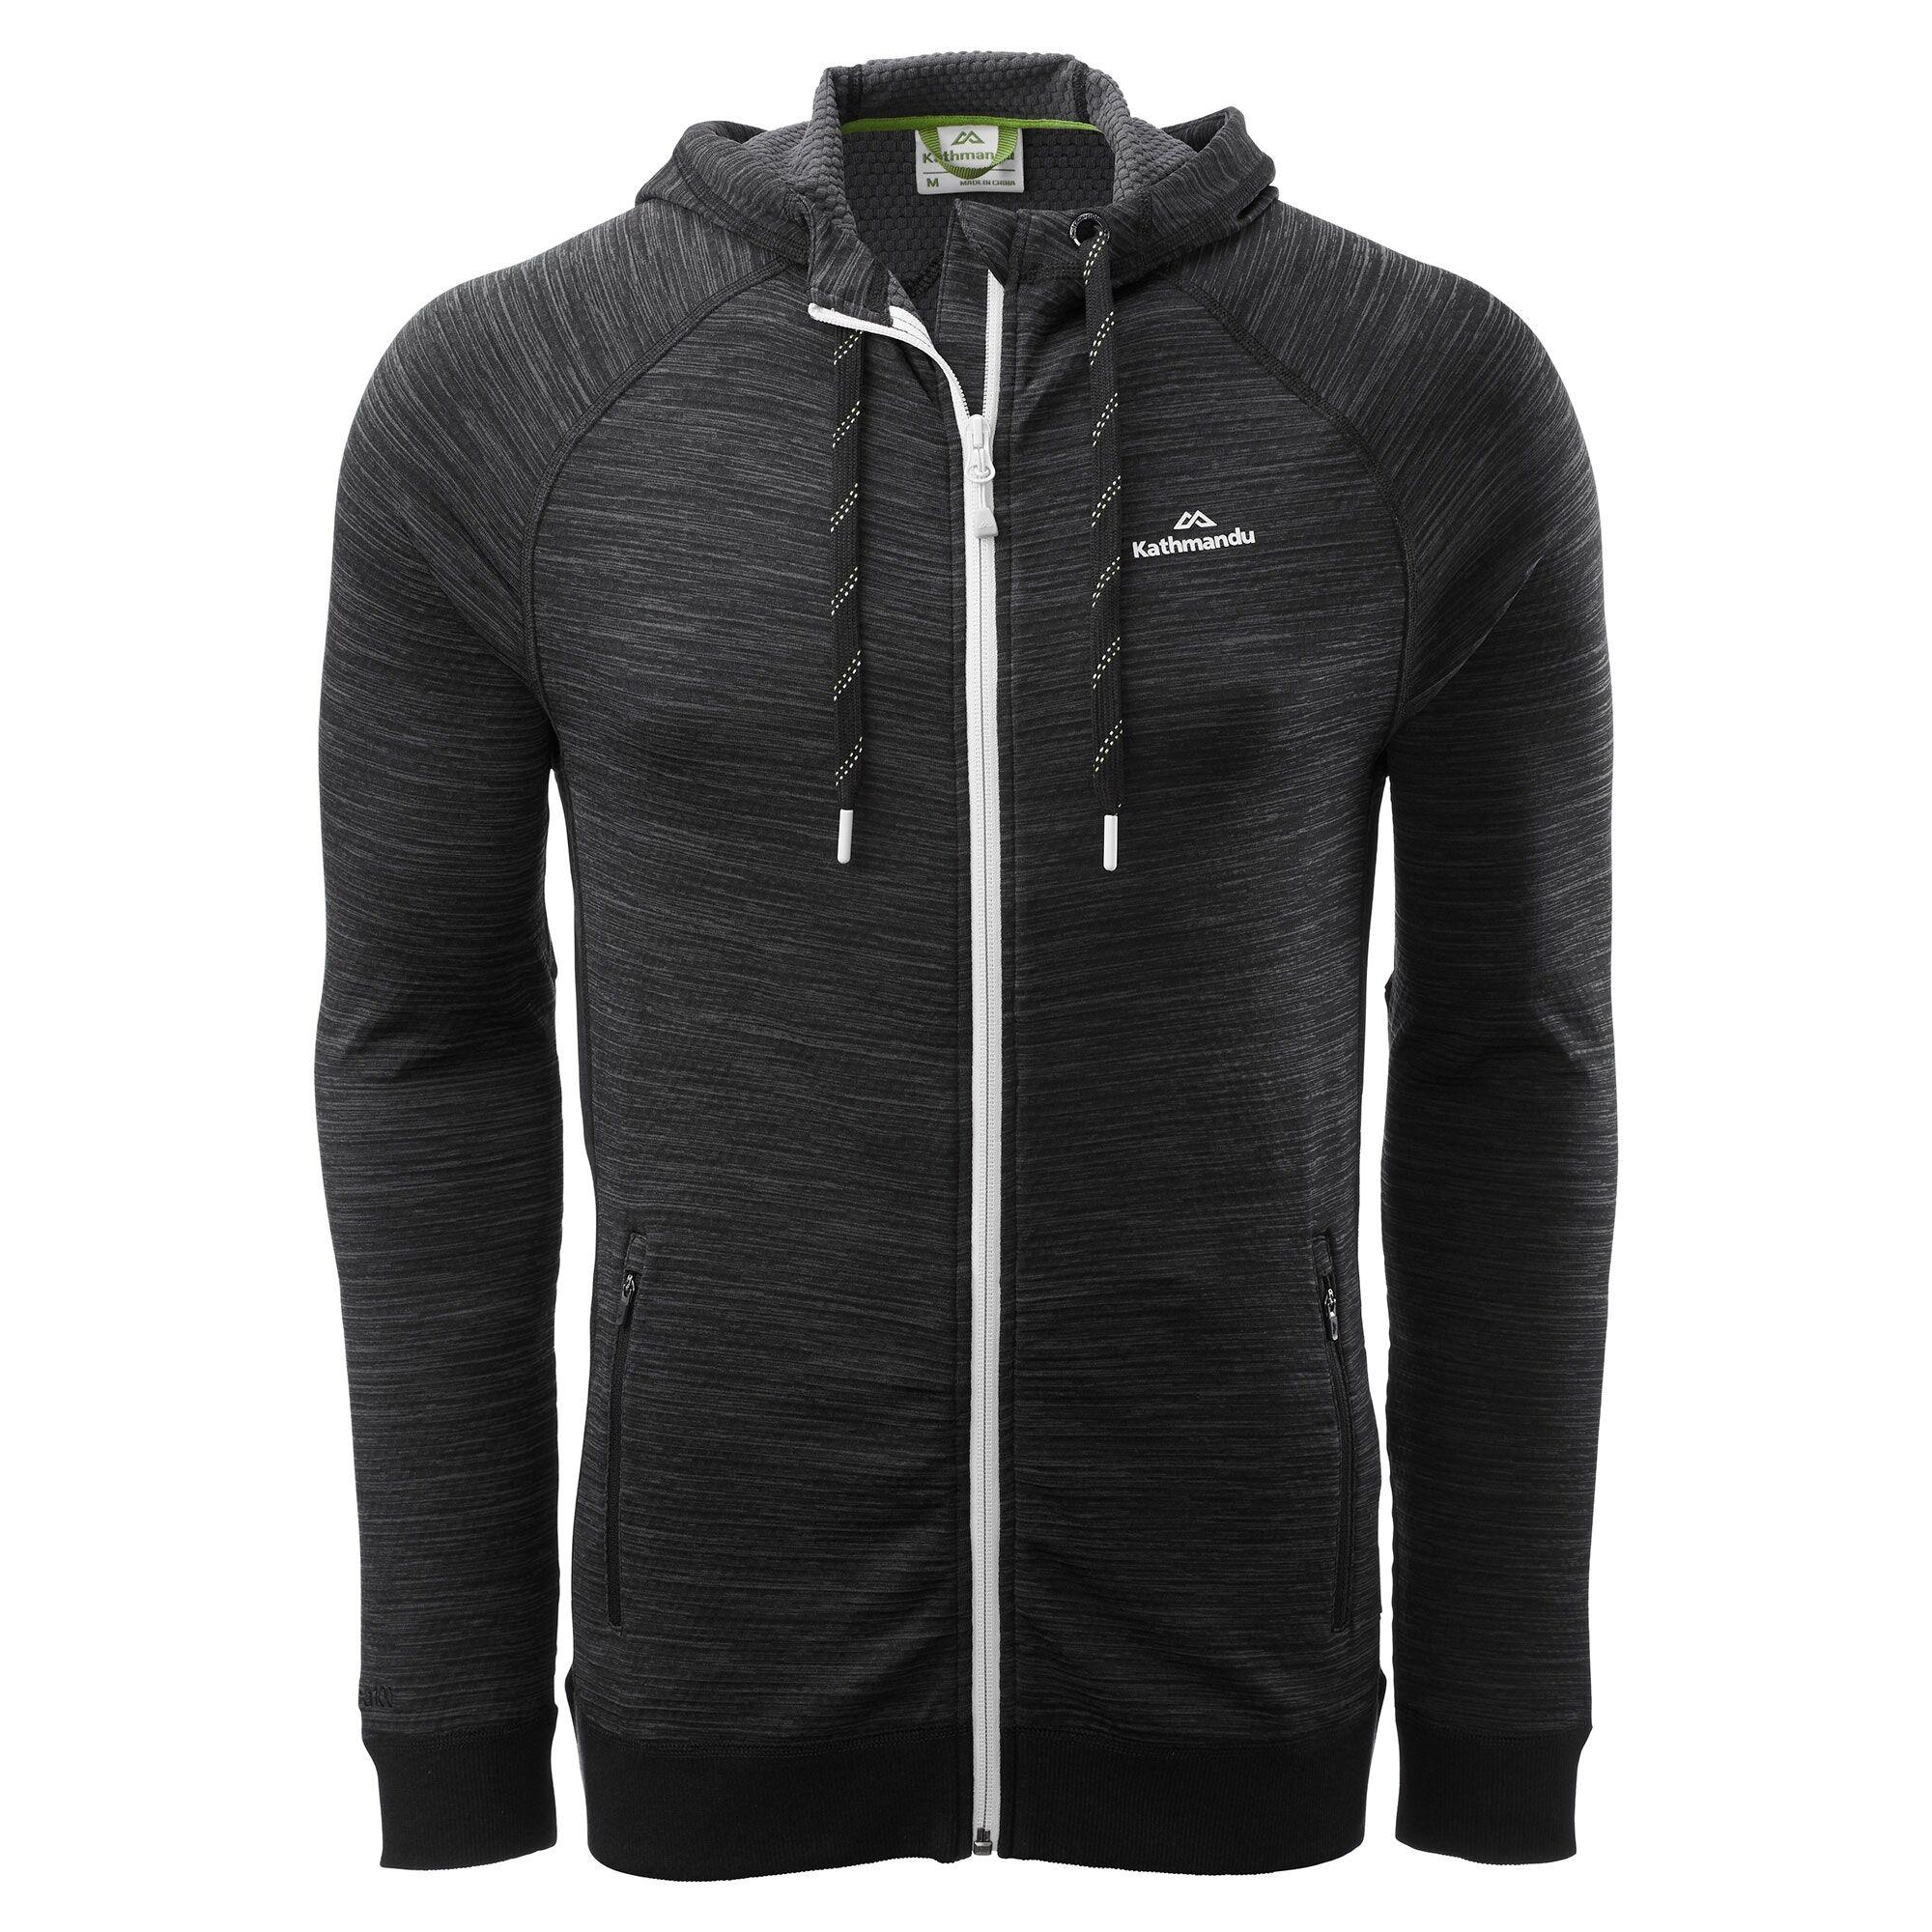 Kathmandu Acota Men's Hooded Fleece Jacket  - Granite Marle/Black - Size: Large